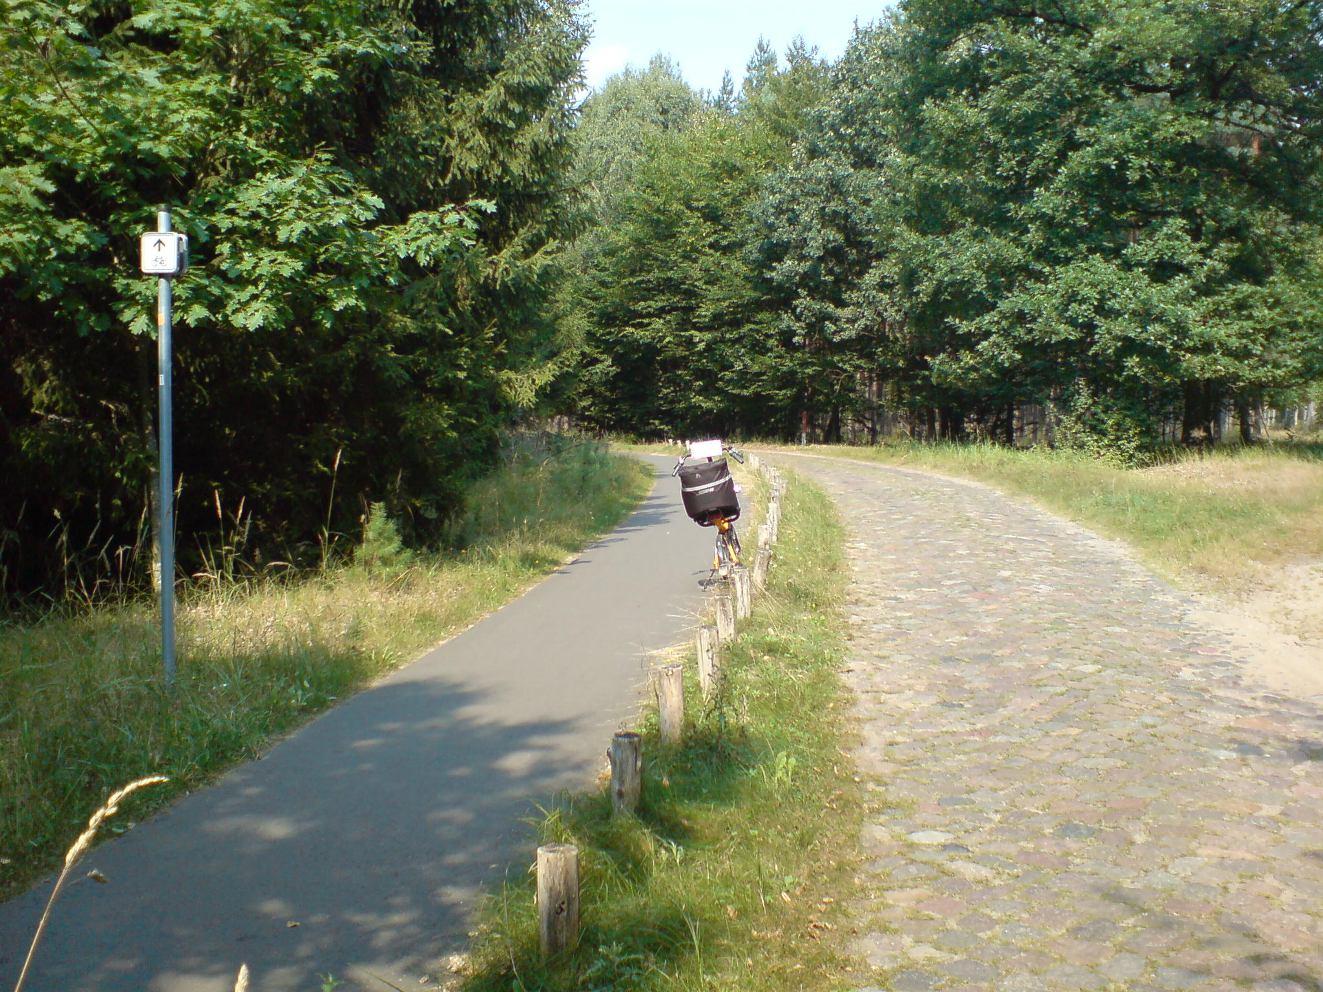 Radweg Berlin Usedom Karte.Velo Touring Reiseführer Radweg Berlin Usedom